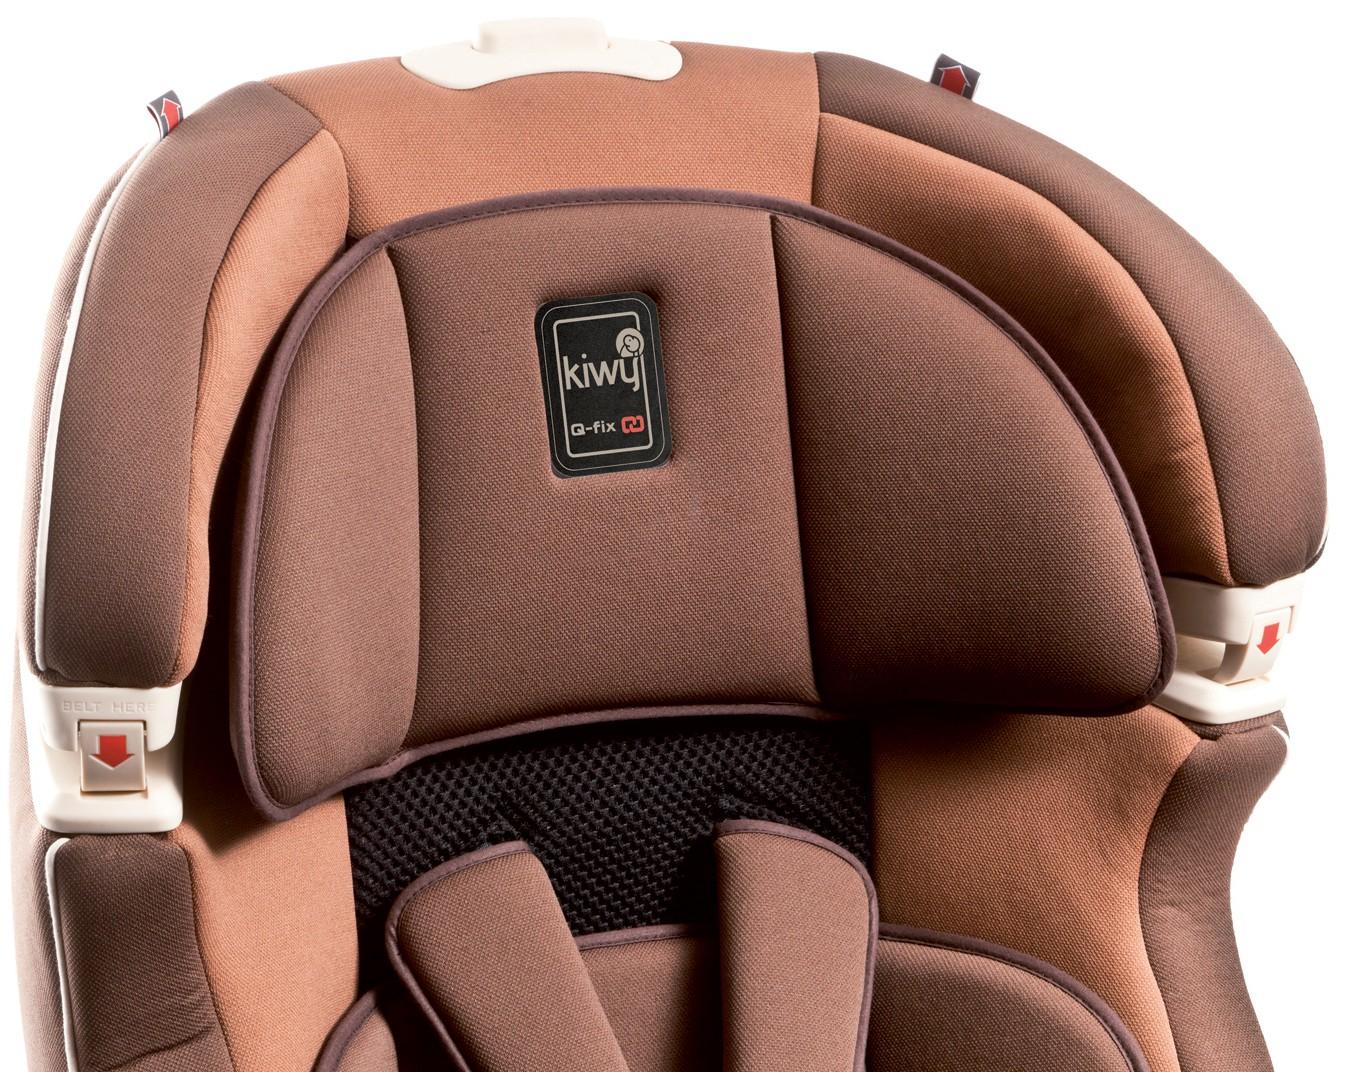 babytop24 kiwy autositz slf123 mit q fix adapter f r isofix moka. Black Bedroom Furniture Sets. Home Design Ideas